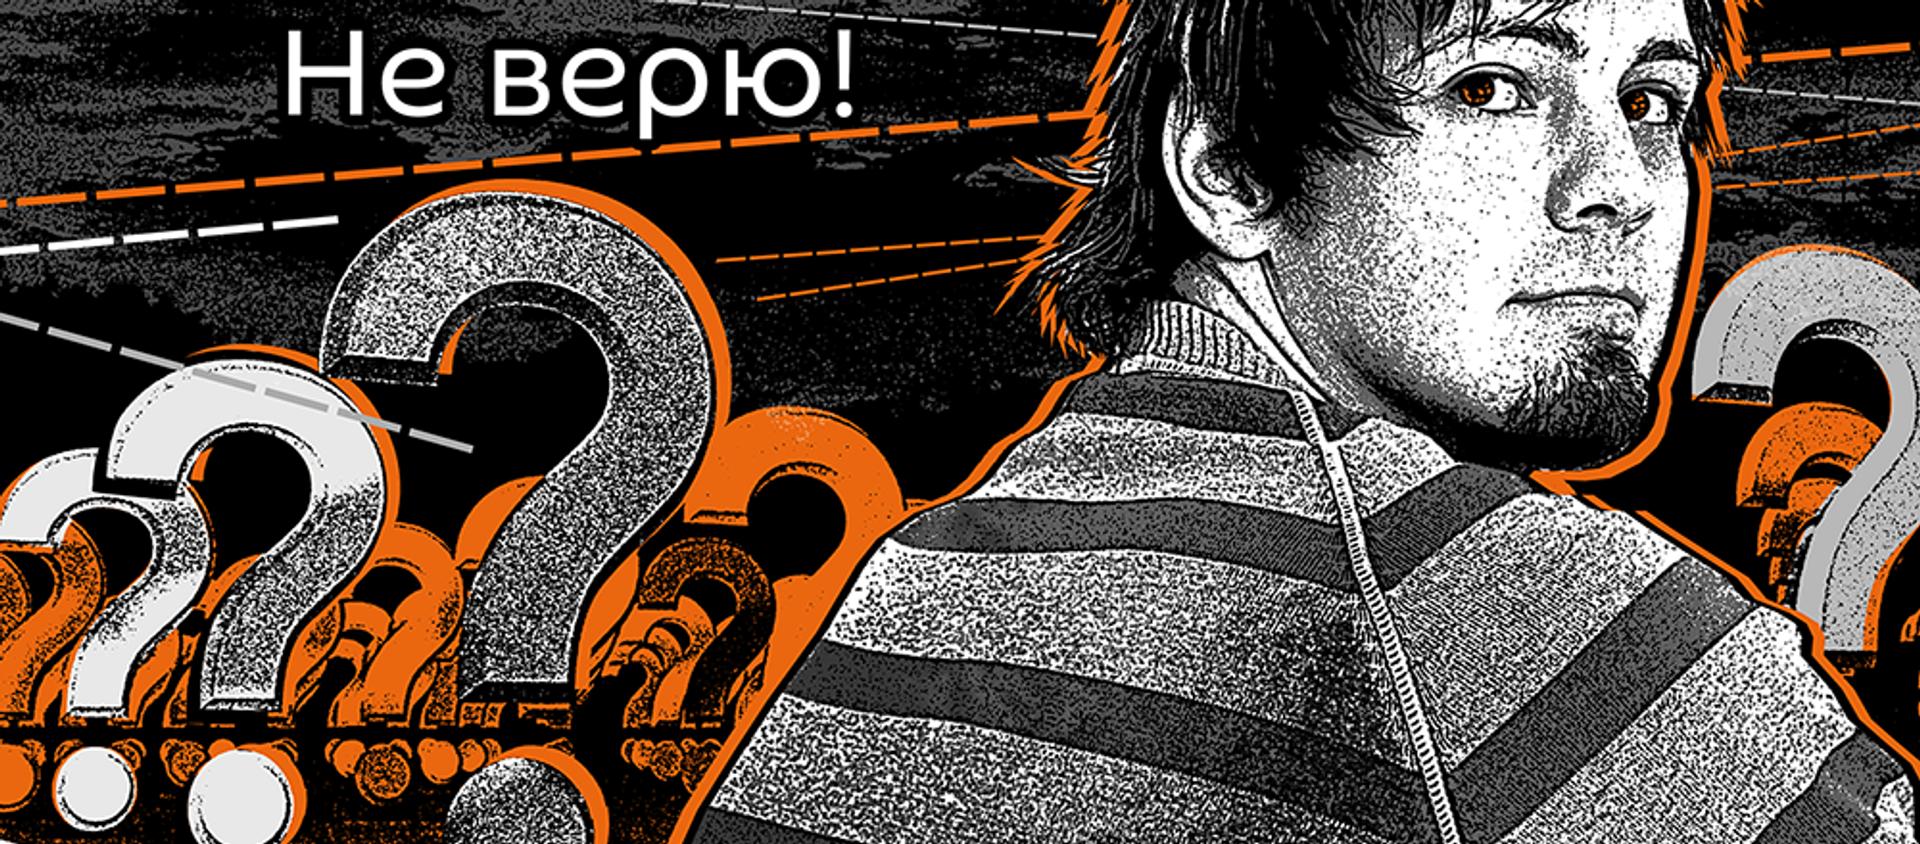 Не верю! - Sputnik Грузия, 1920, 09.01.2021